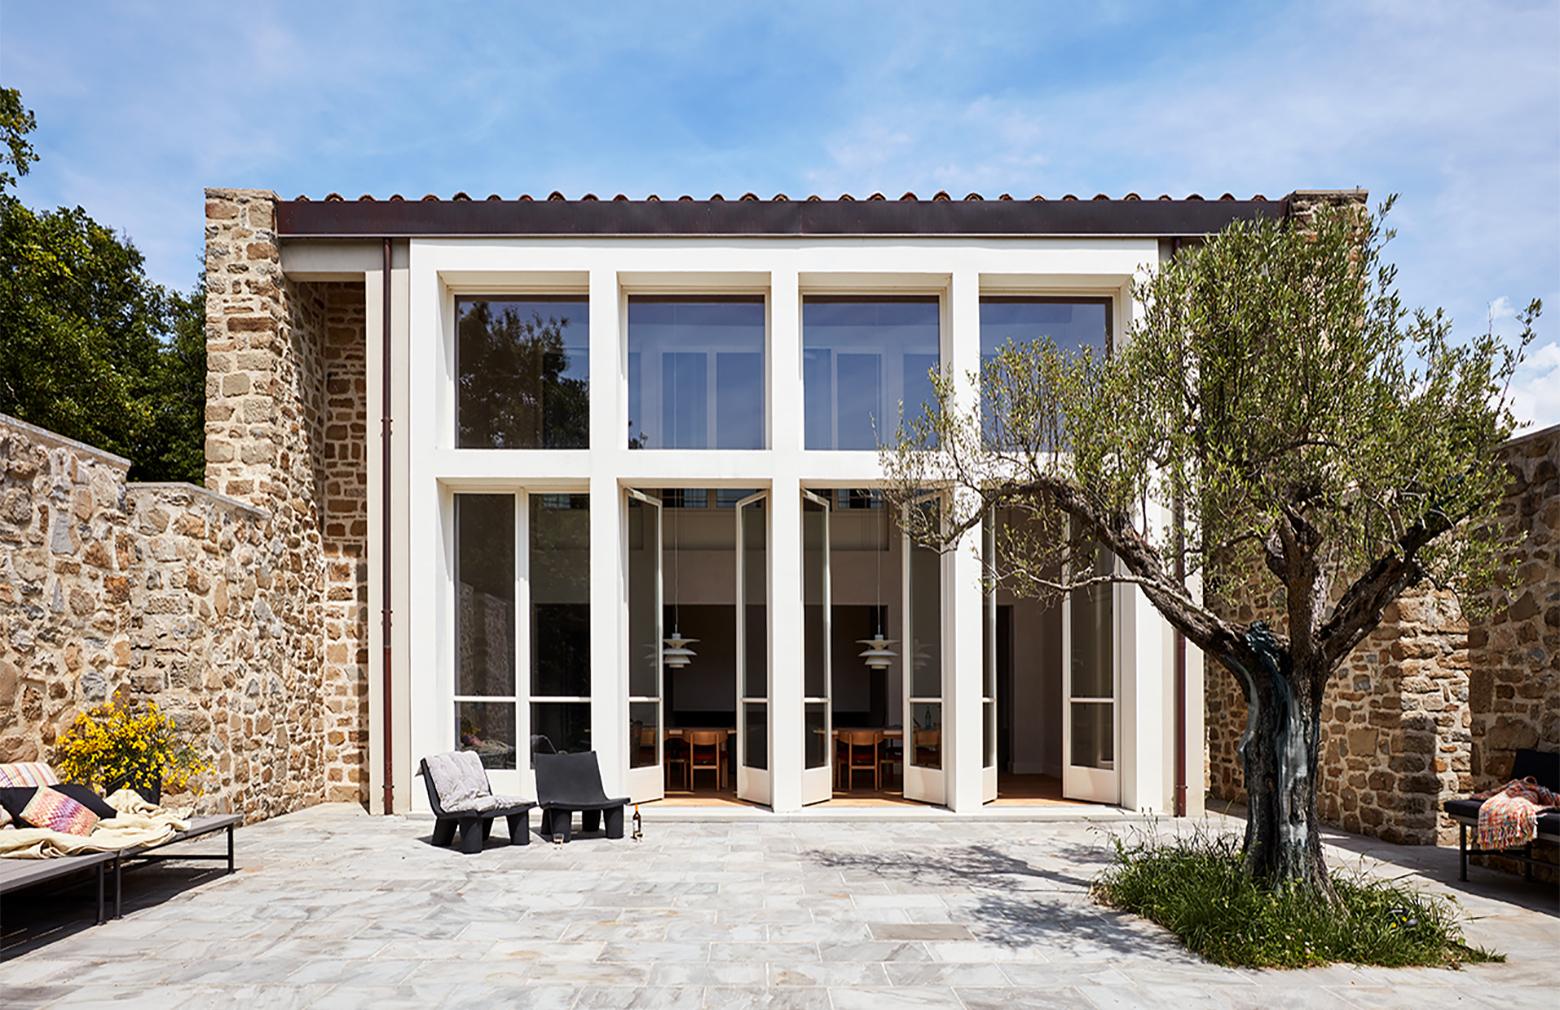 Holiday Home Of The Week A Modern Hilltop Villa In San Pellegrino